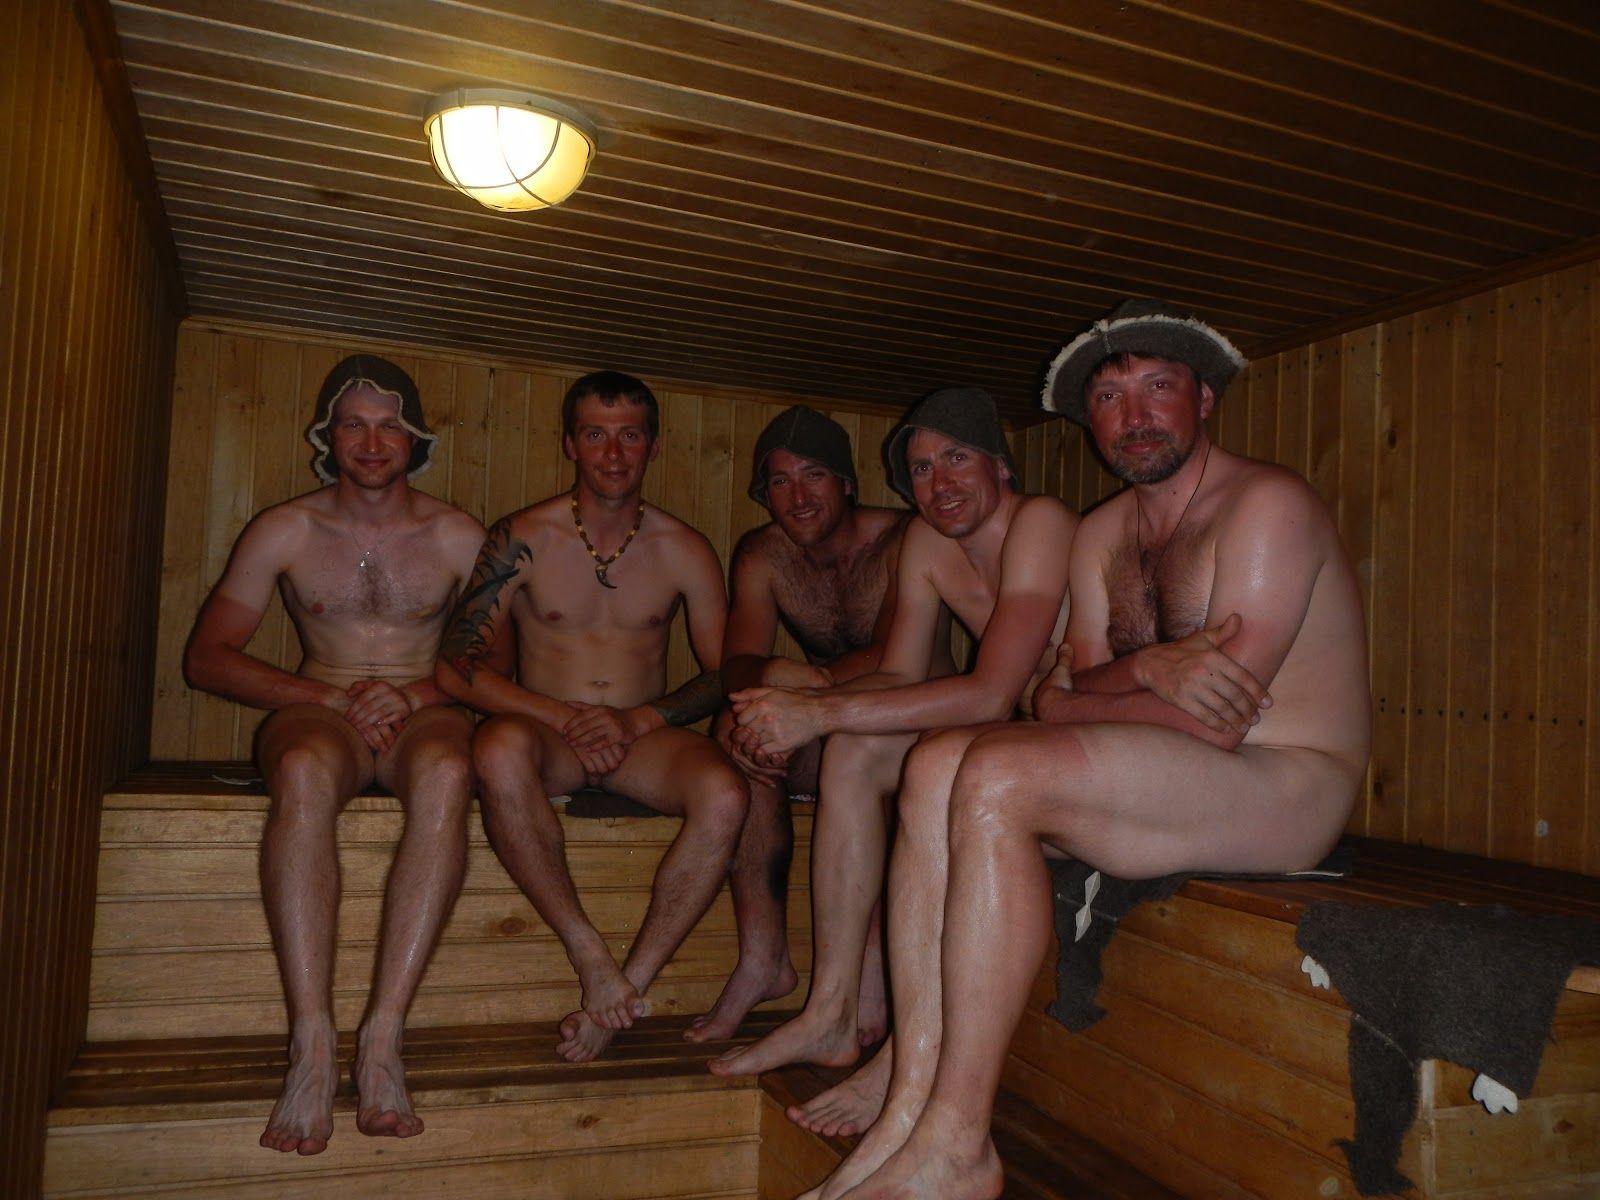 banya russia  Google Search  Banya  Pinterest  Saunas